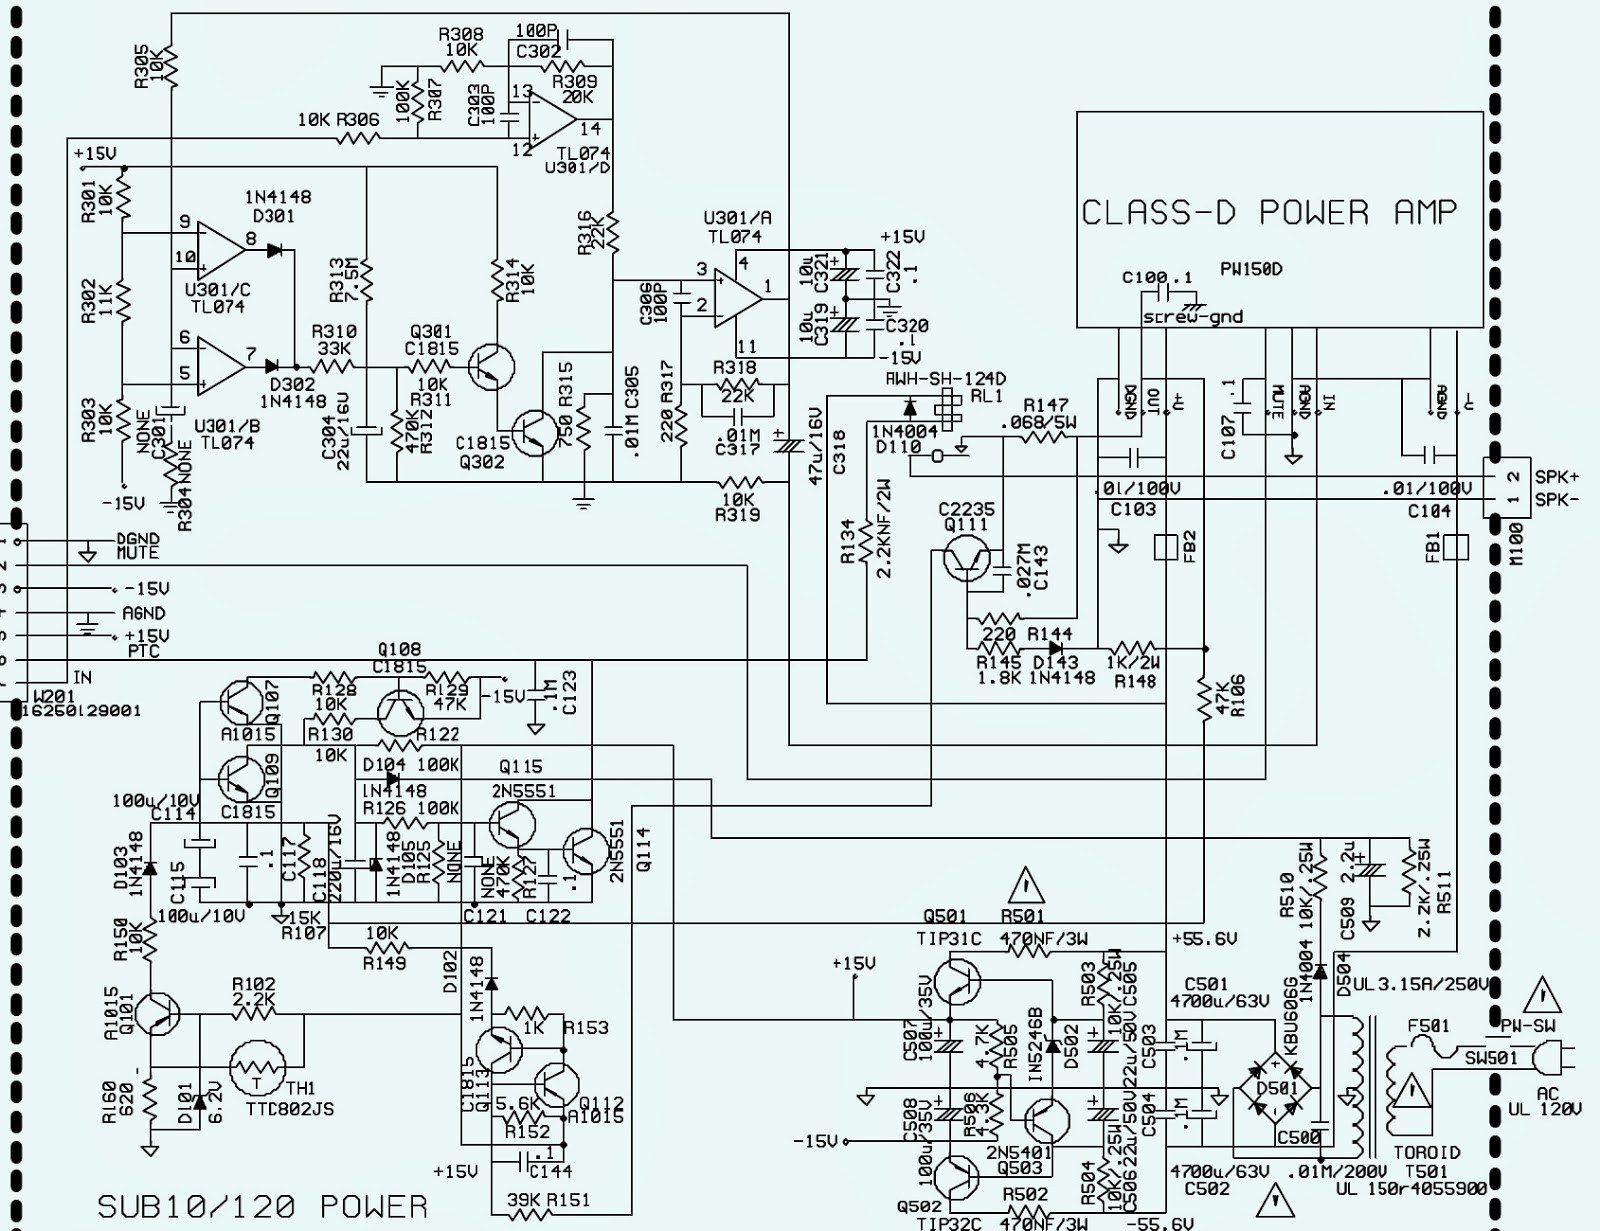 medium resolution of jbl powered subwoofer schematic diagram universal wiring diagram 600 ampsubwoofer schematic circuit diagram electro help wiring